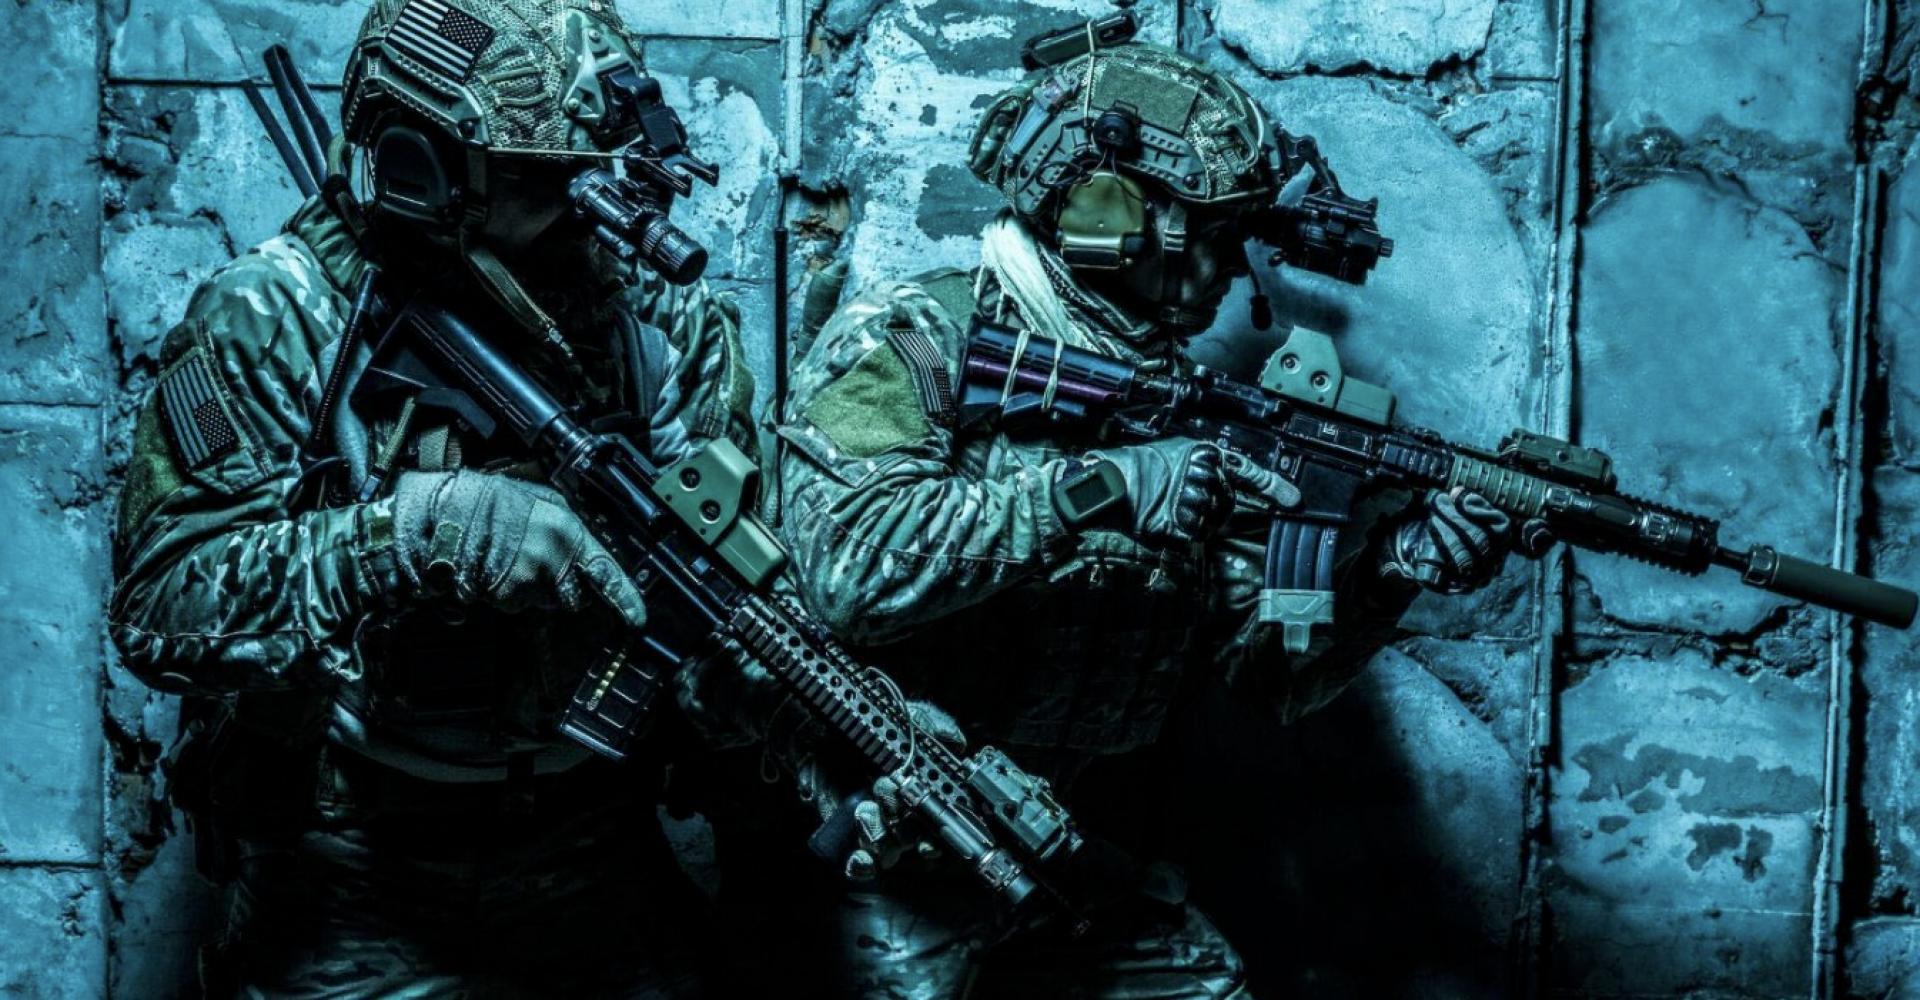 Blog Special forces mindset en weerbaarheid vergroten